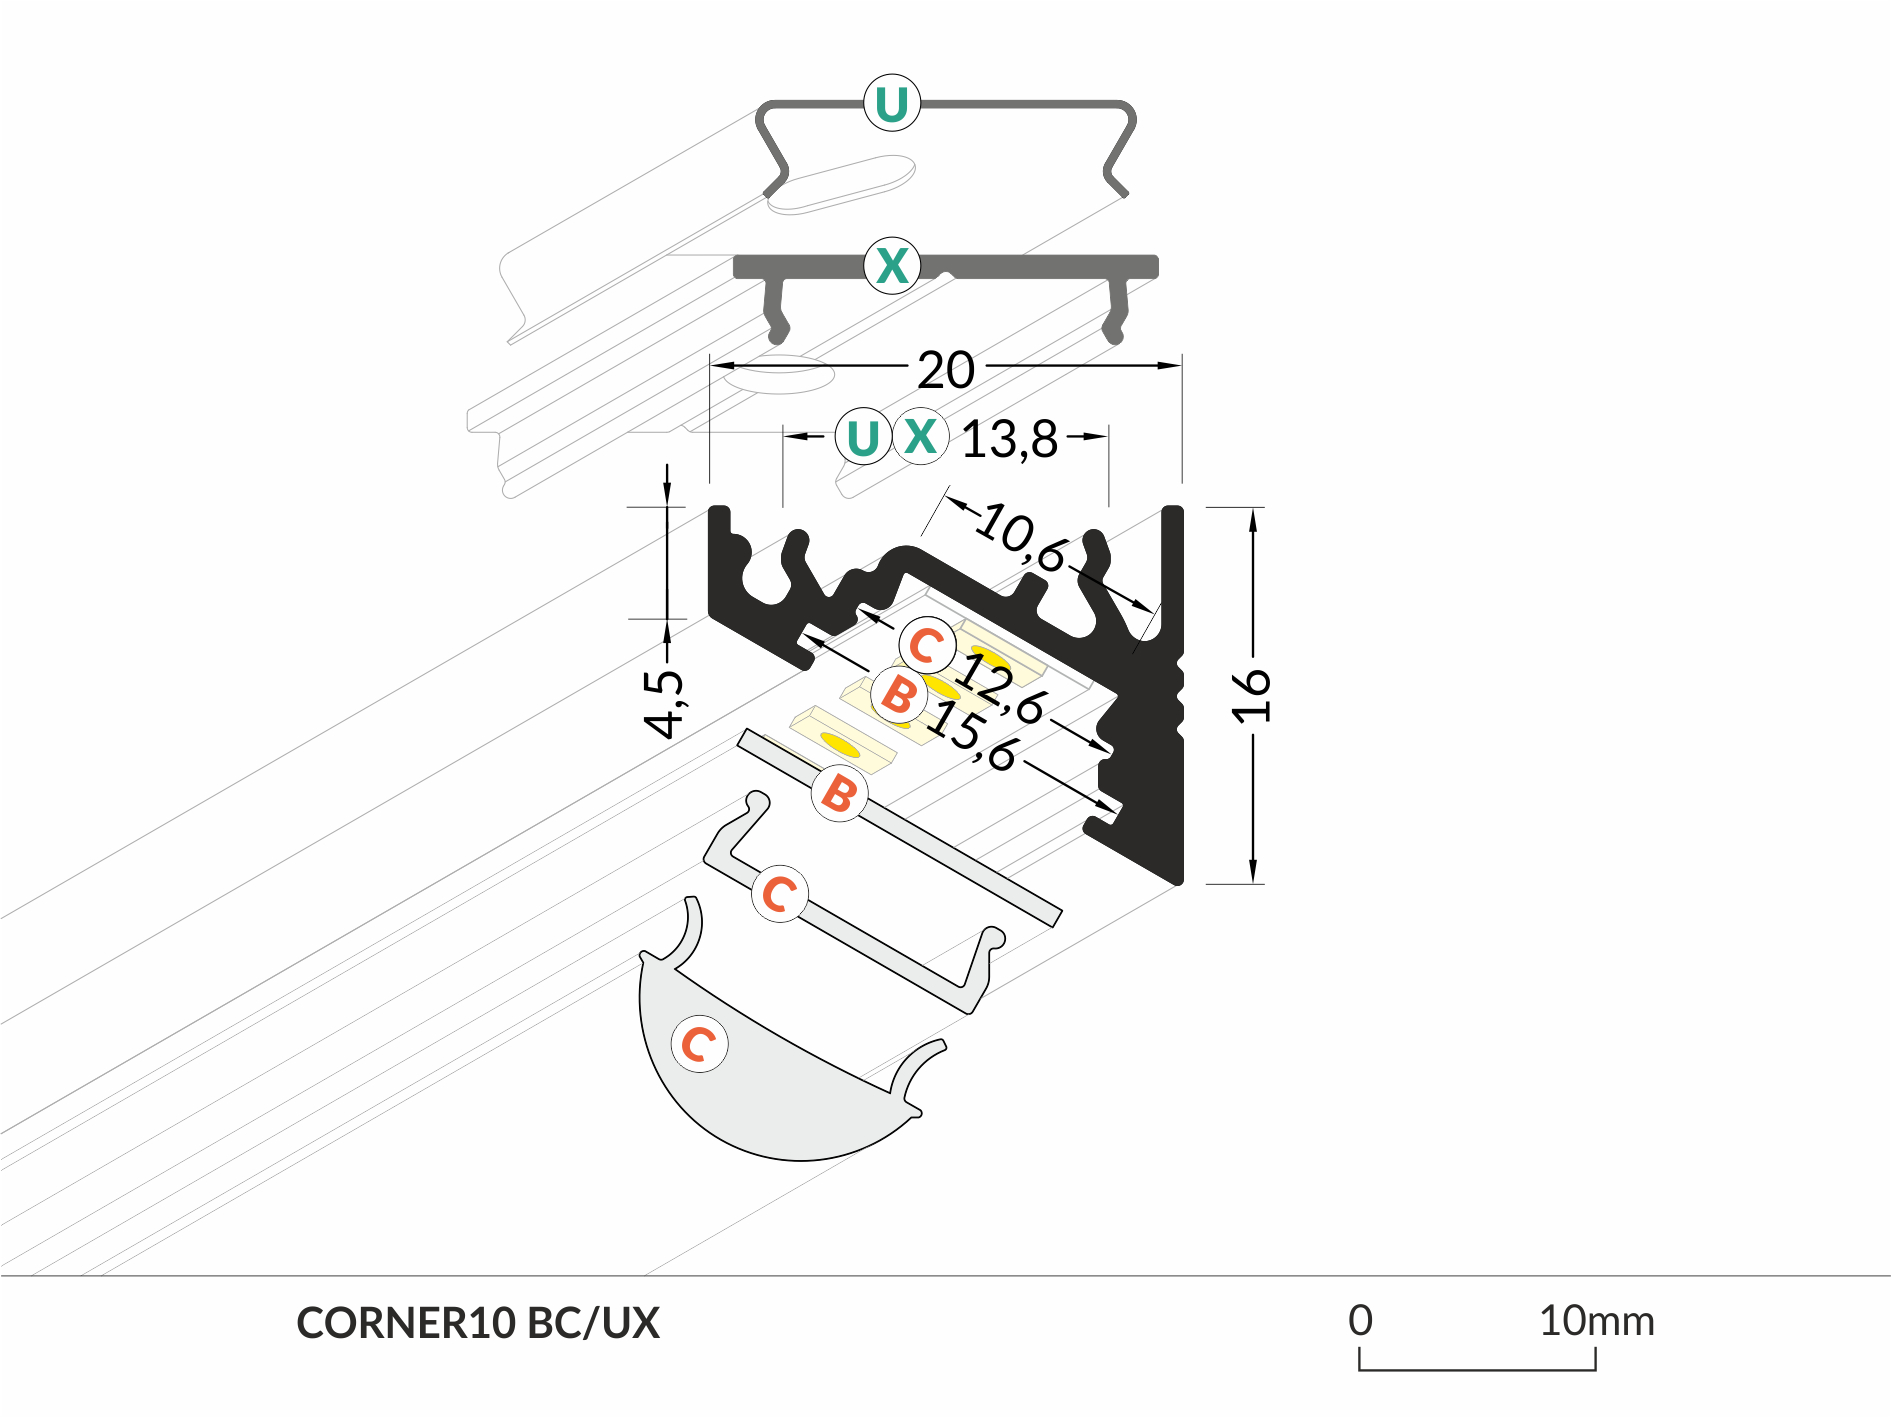 LED_profile_CORNER10_dimensions.jpg